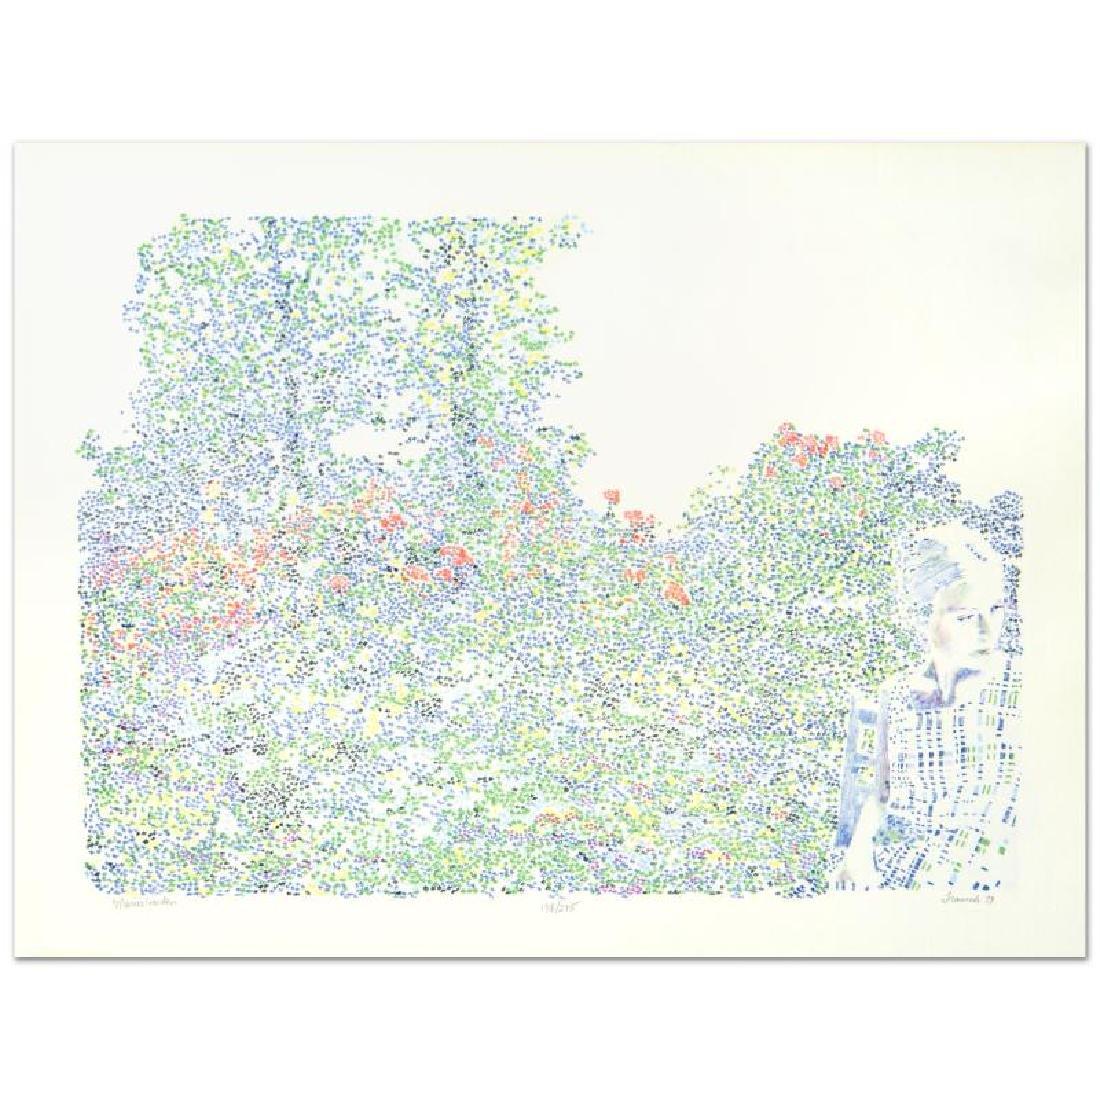 "Traudi Flaxman - ""Marie's Garden"" Limited Edition - 3"